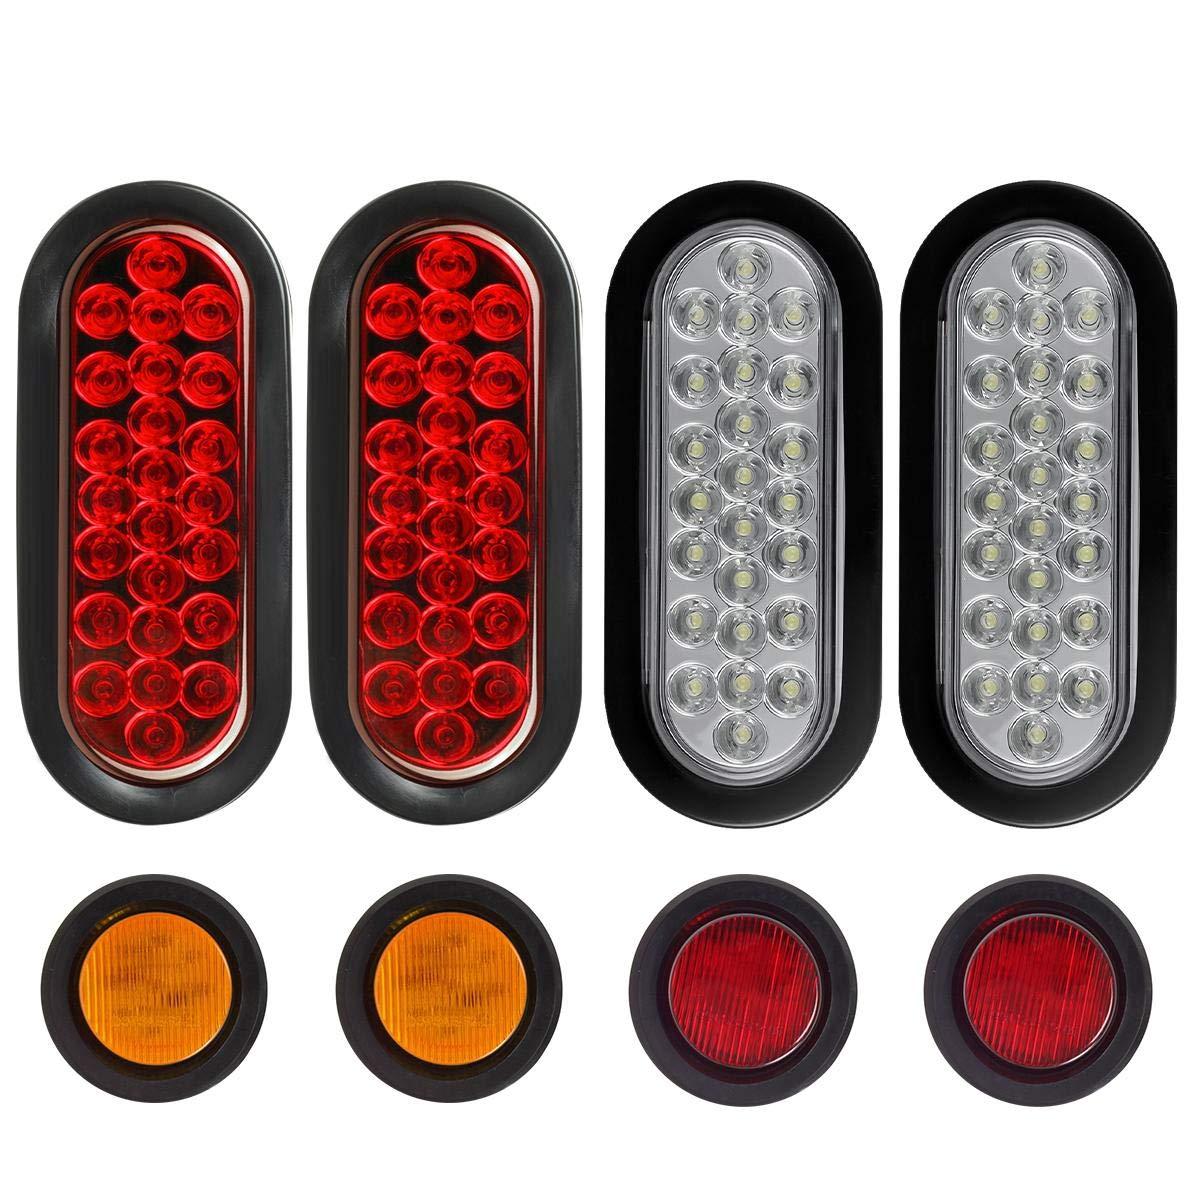 Partsam Oval Led Trailer Lights Kit, 6 Inch Trailer Tail and Backup Lights, 2'' Inch Sealed Round led Side Marker Lights, Oval Led Stop Turn Tail Brake Reverse Lights(Pack of 8) by Partsam